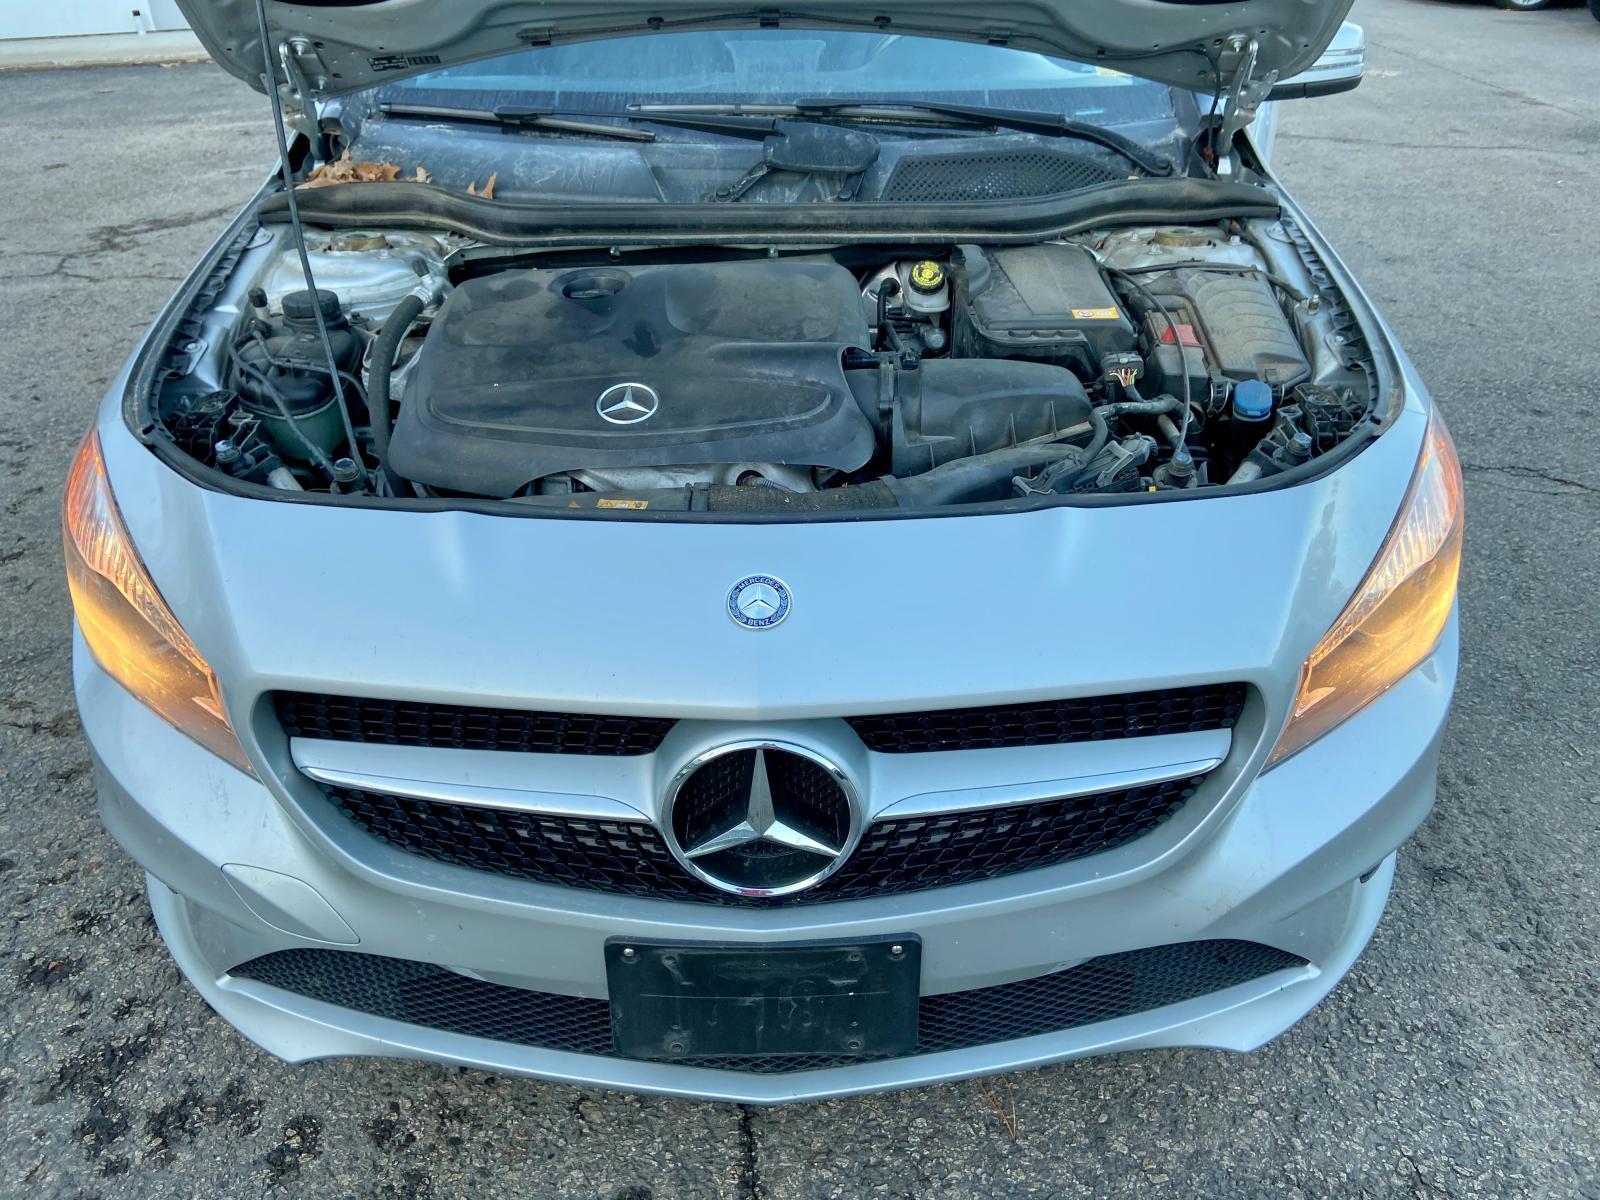 WDDSJ4EB9EN060365 - 2014 Mercedes-Benz Cla 250 2.0L front view